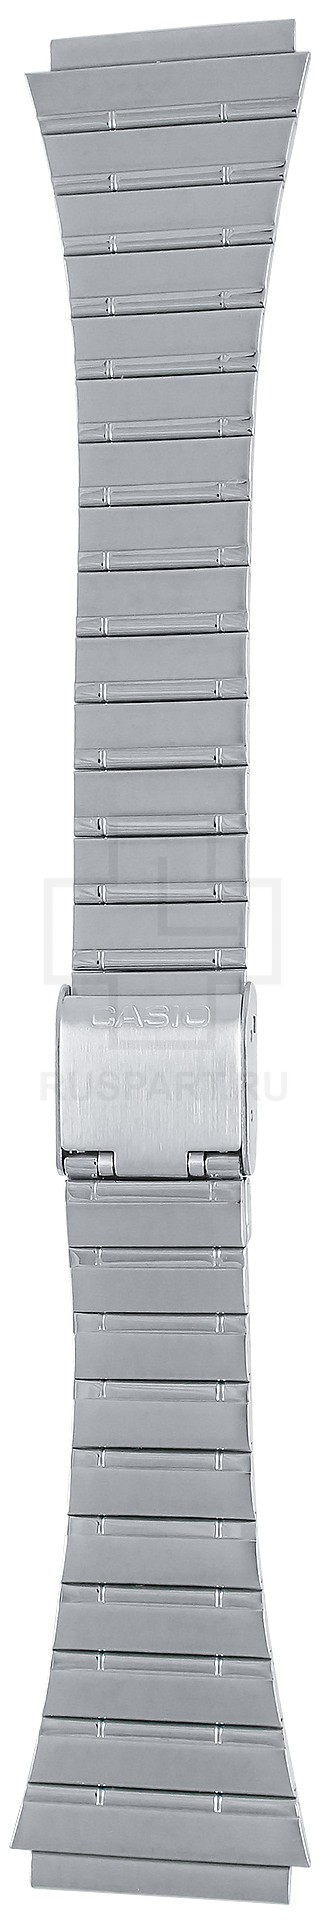 браслет Casio 71604021 DBC-1500B-1